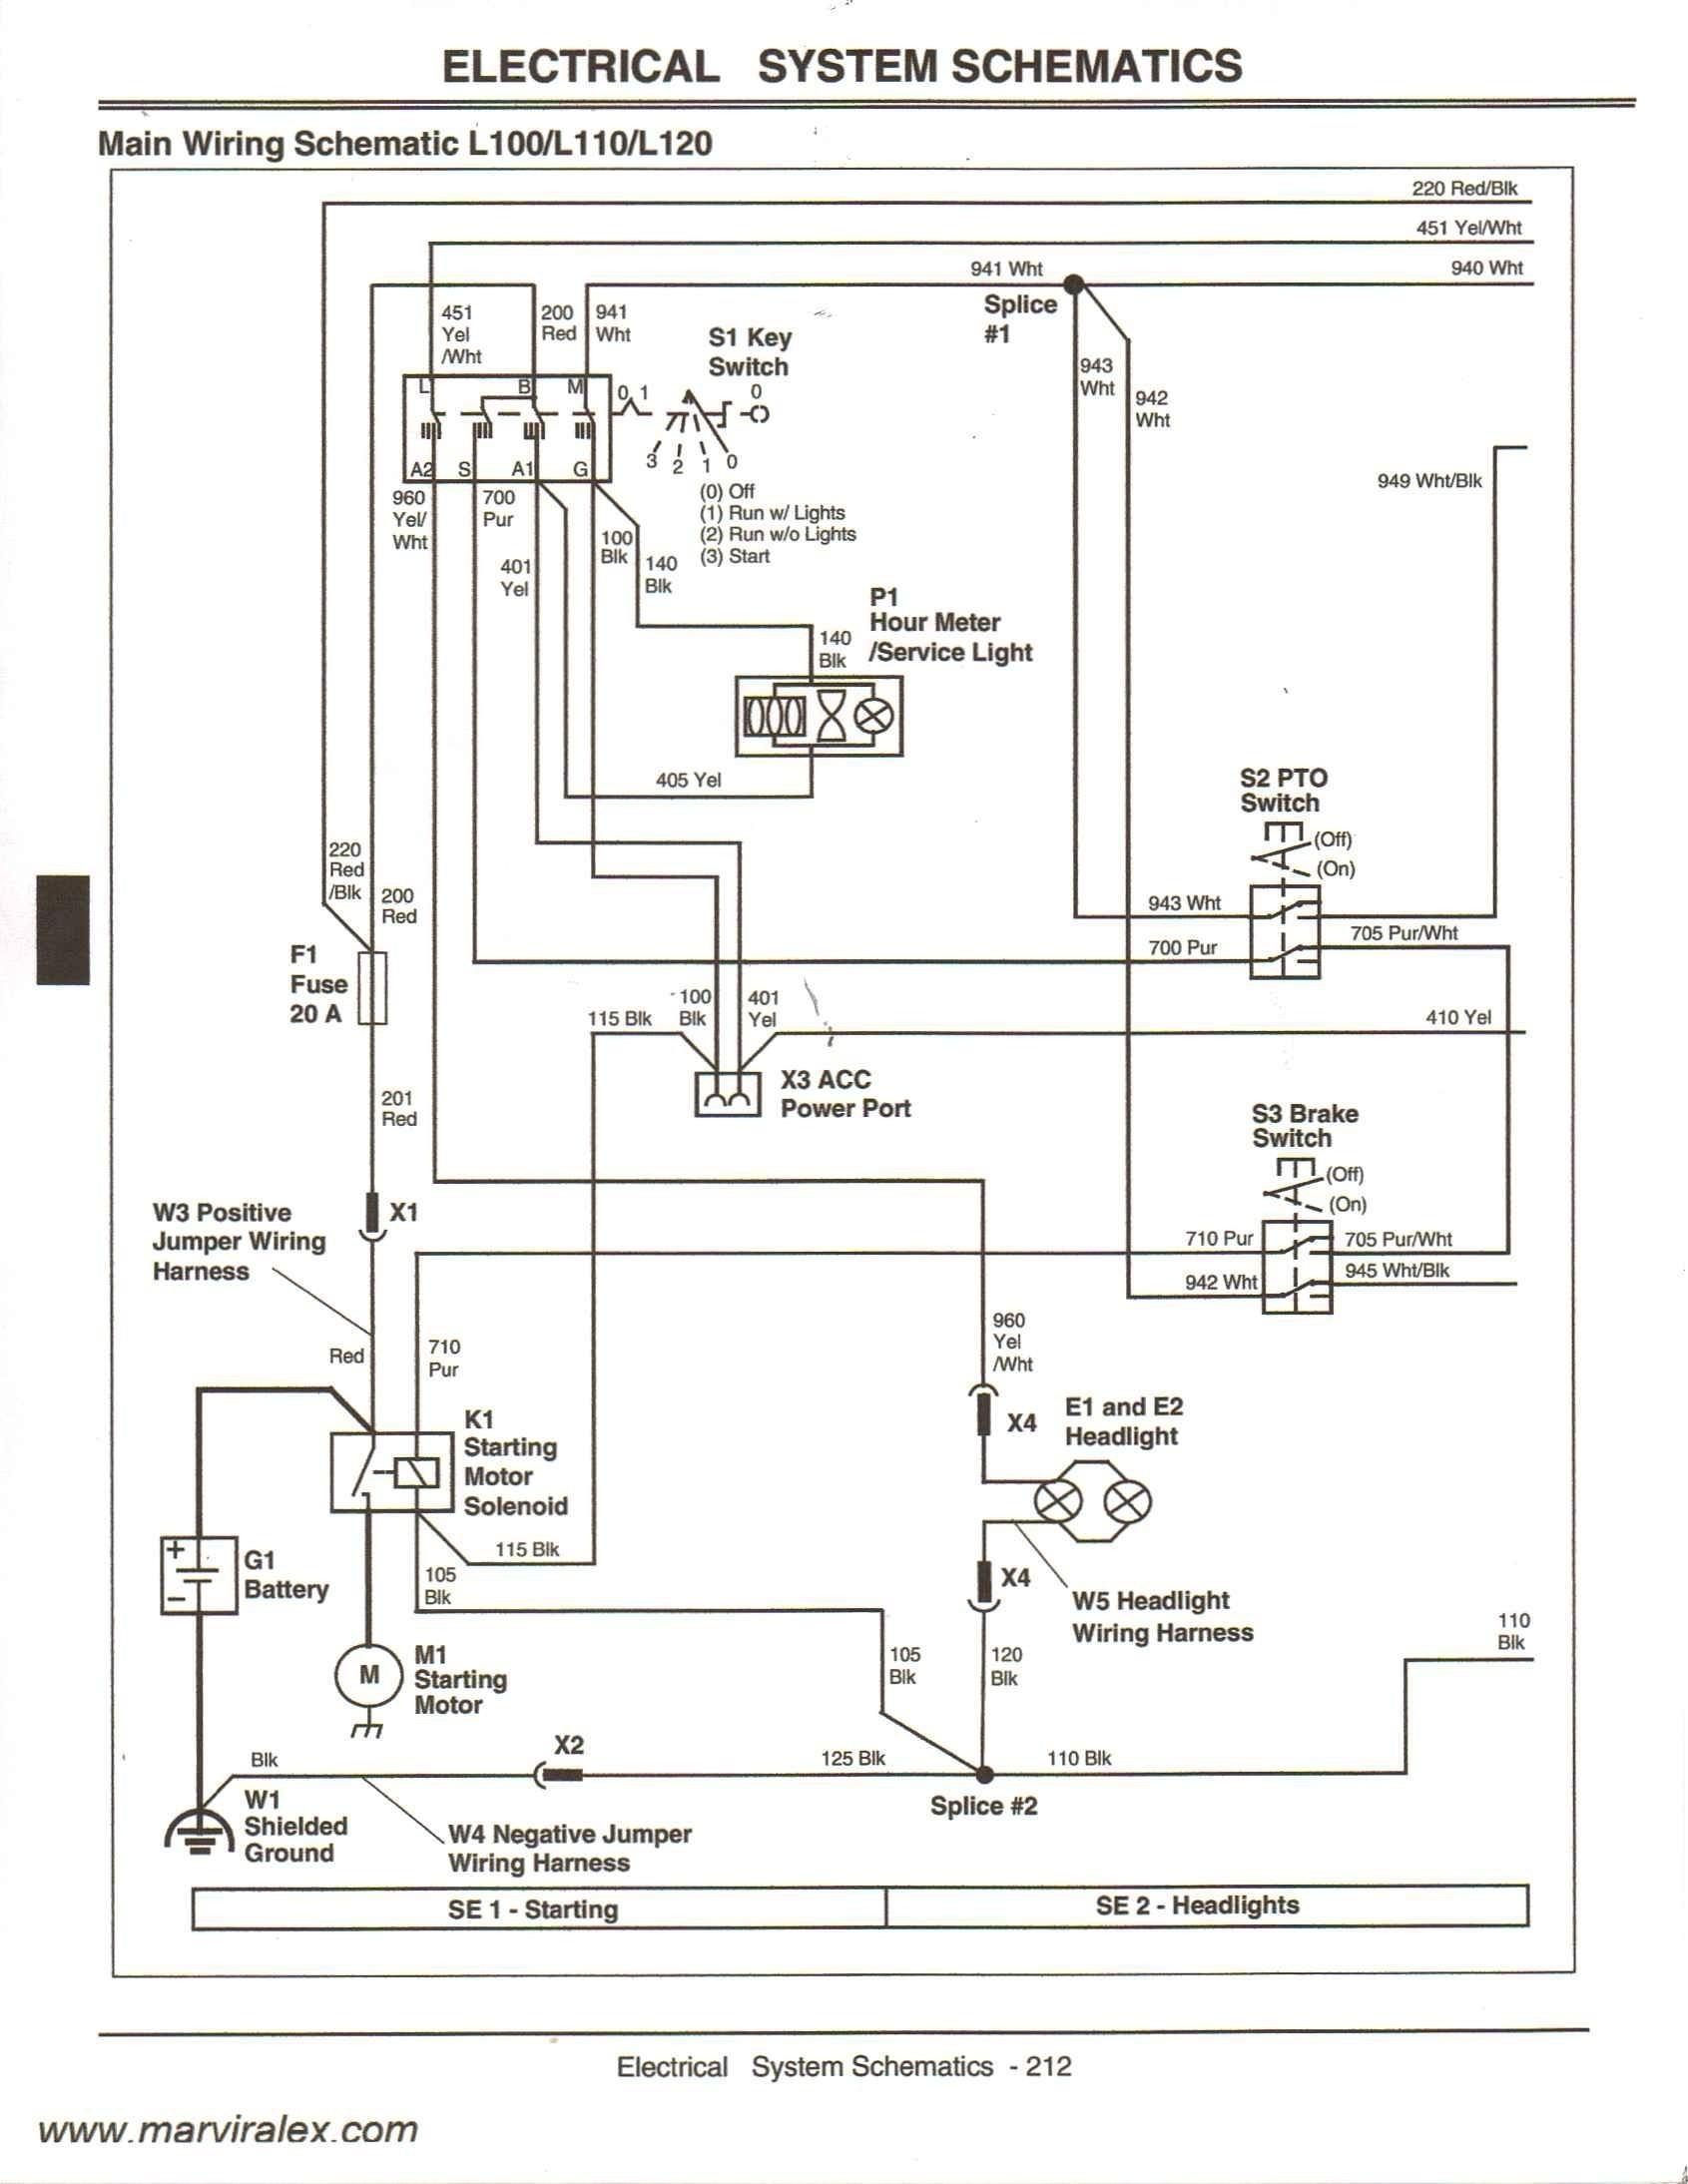 Wiring Diagram John Deere 318 New Inspirationa Wiring Diagram for A John Deere 318